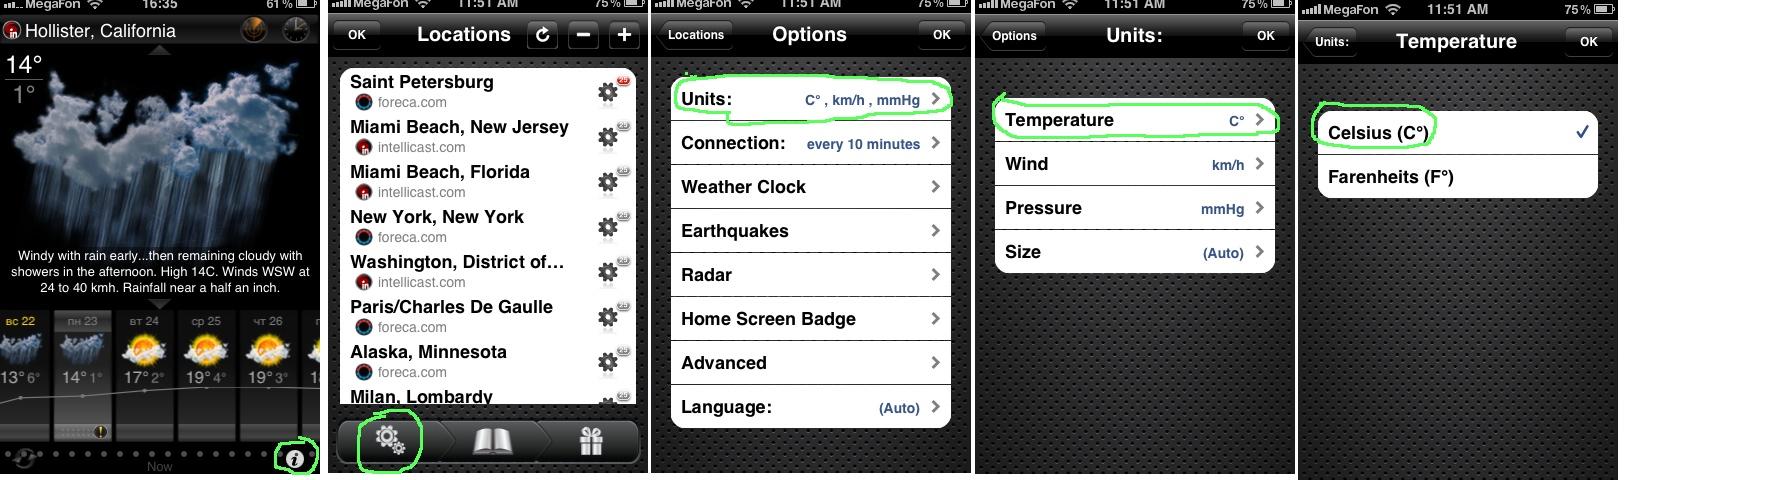 eWeather hd weather app iphone,ipad,ipod hi-def radar, satellite, weather alerts, earthquakes, beach water, sea surface - units